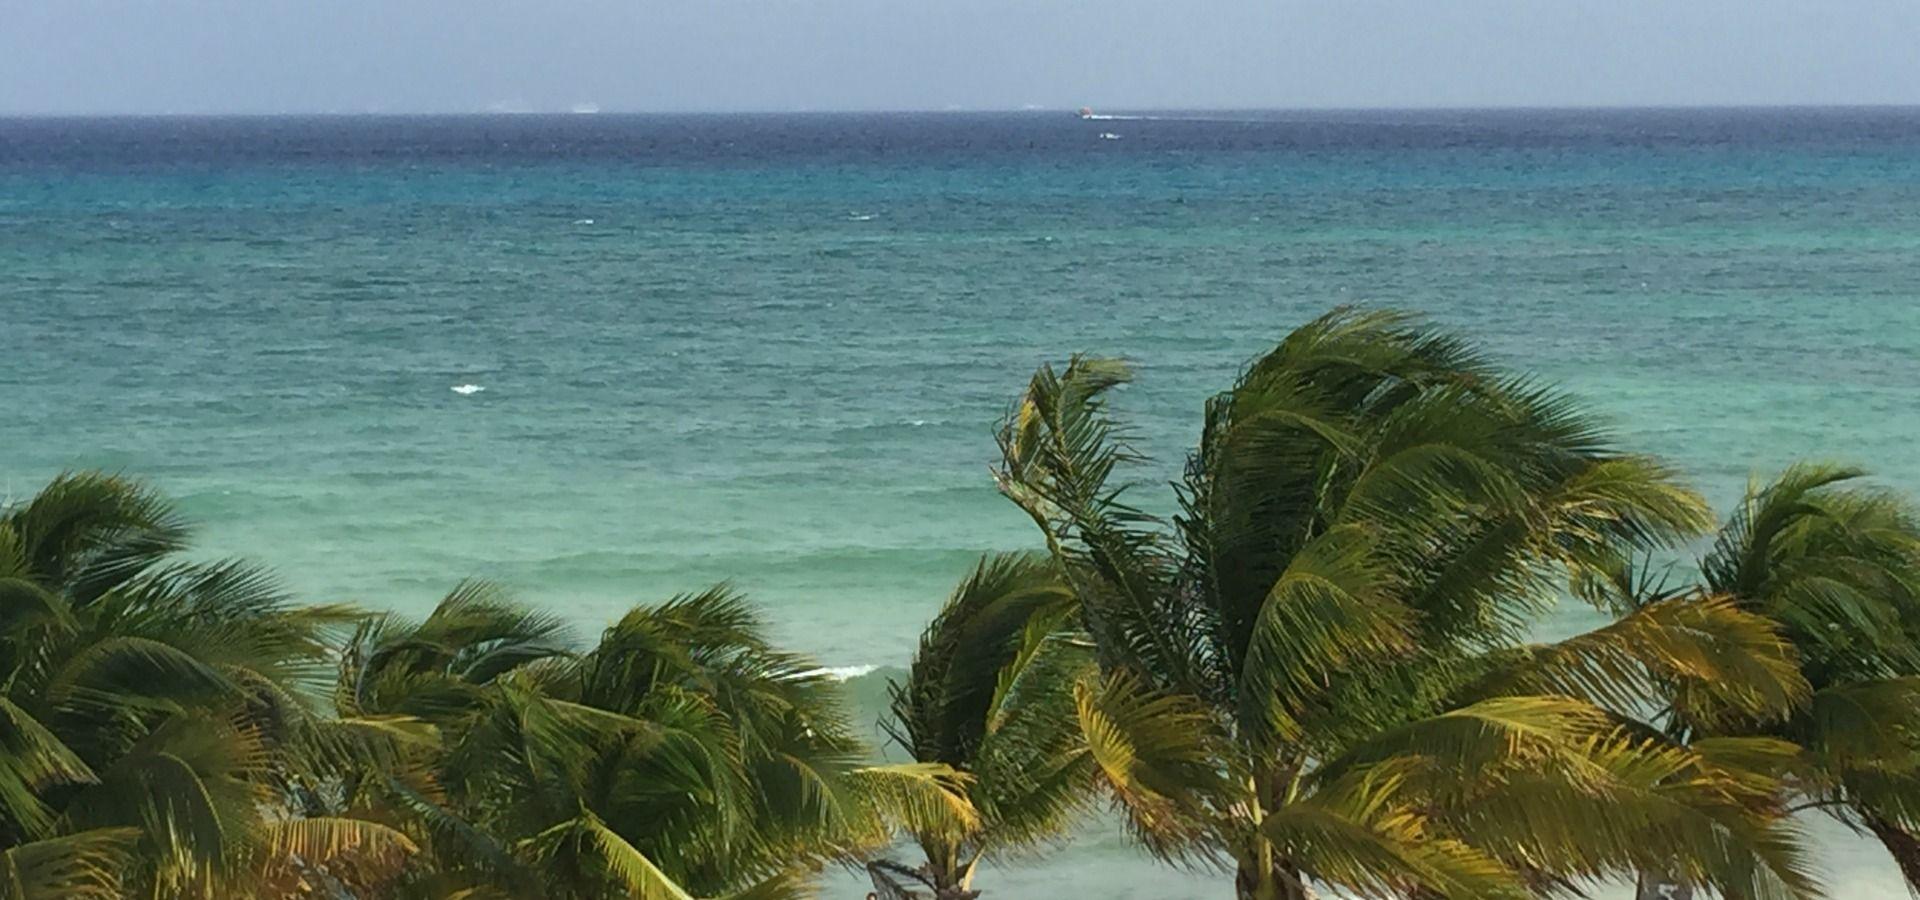 Cancun Vs Playa Del Carmen Where Should You Stay Family Travel Riviera Maya Cancun Riviera Maya